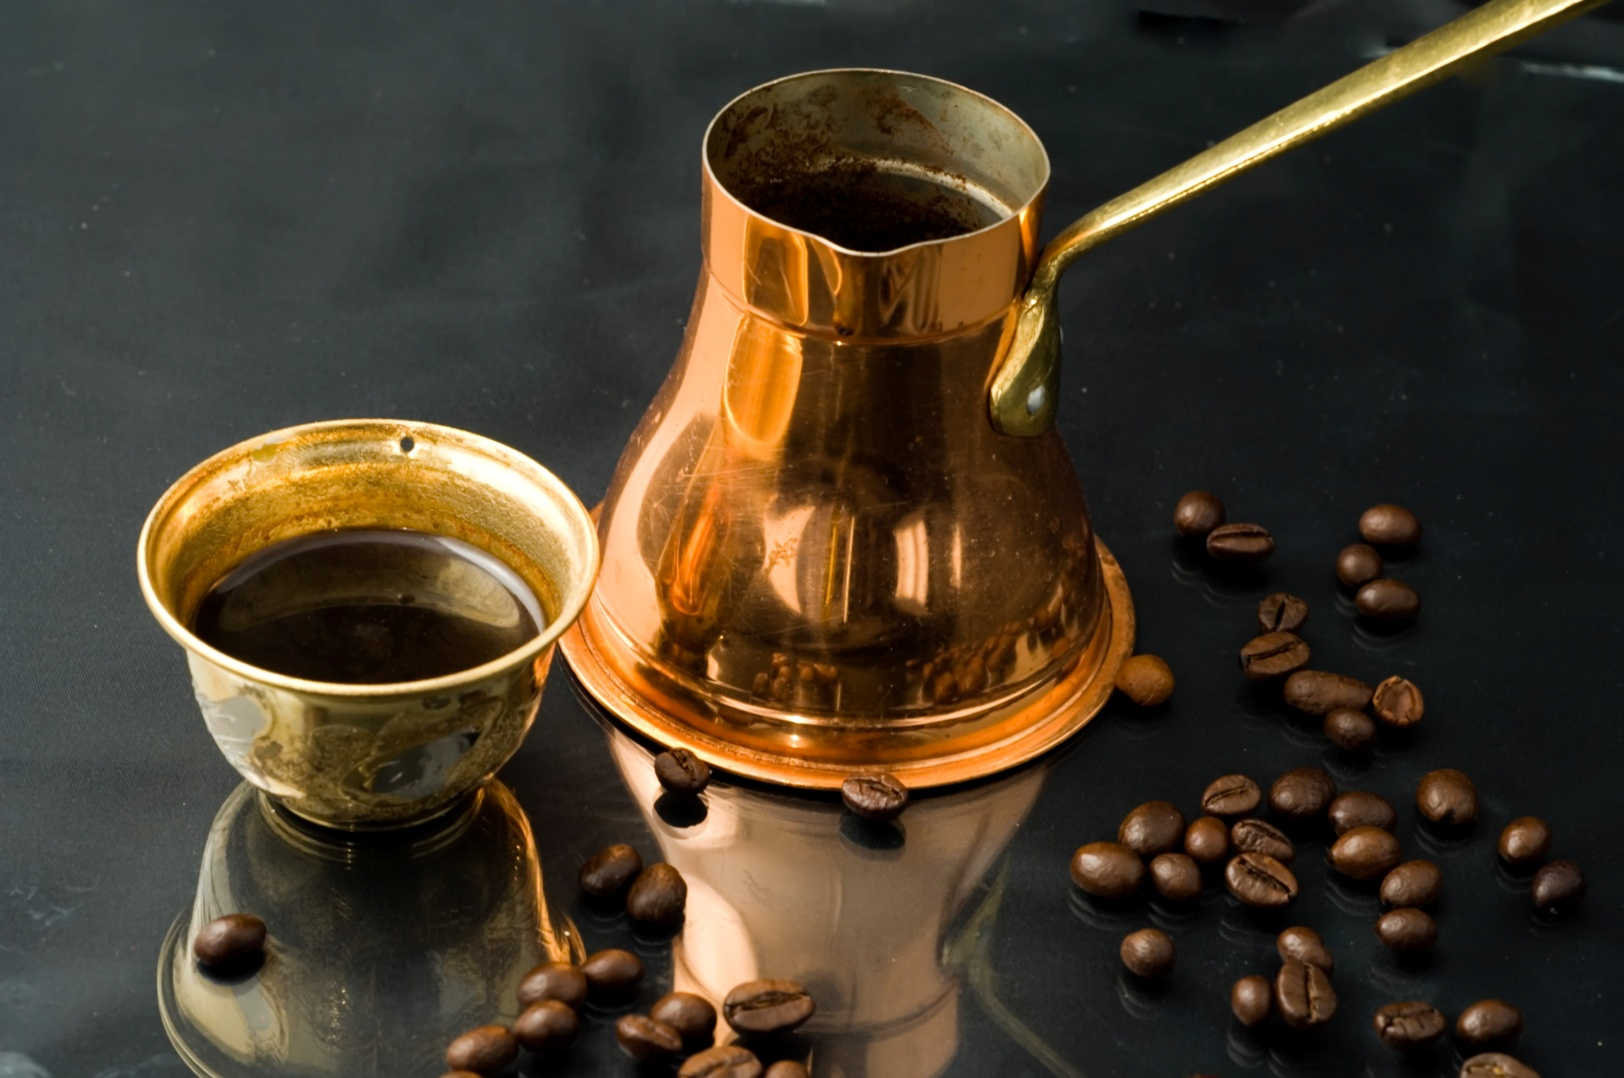 https://www.abbyy.com/media/28033/coffee-1.jpg